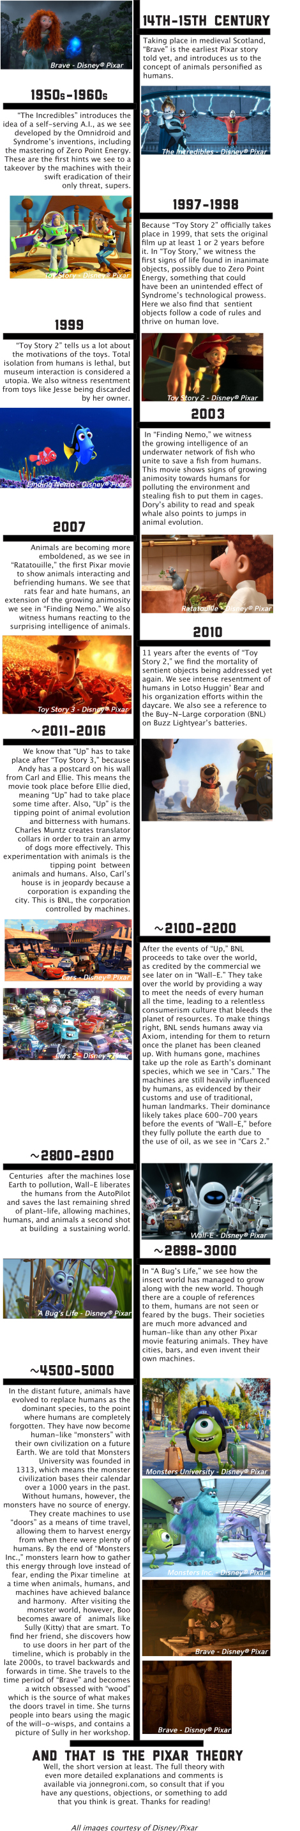 pixar-theory